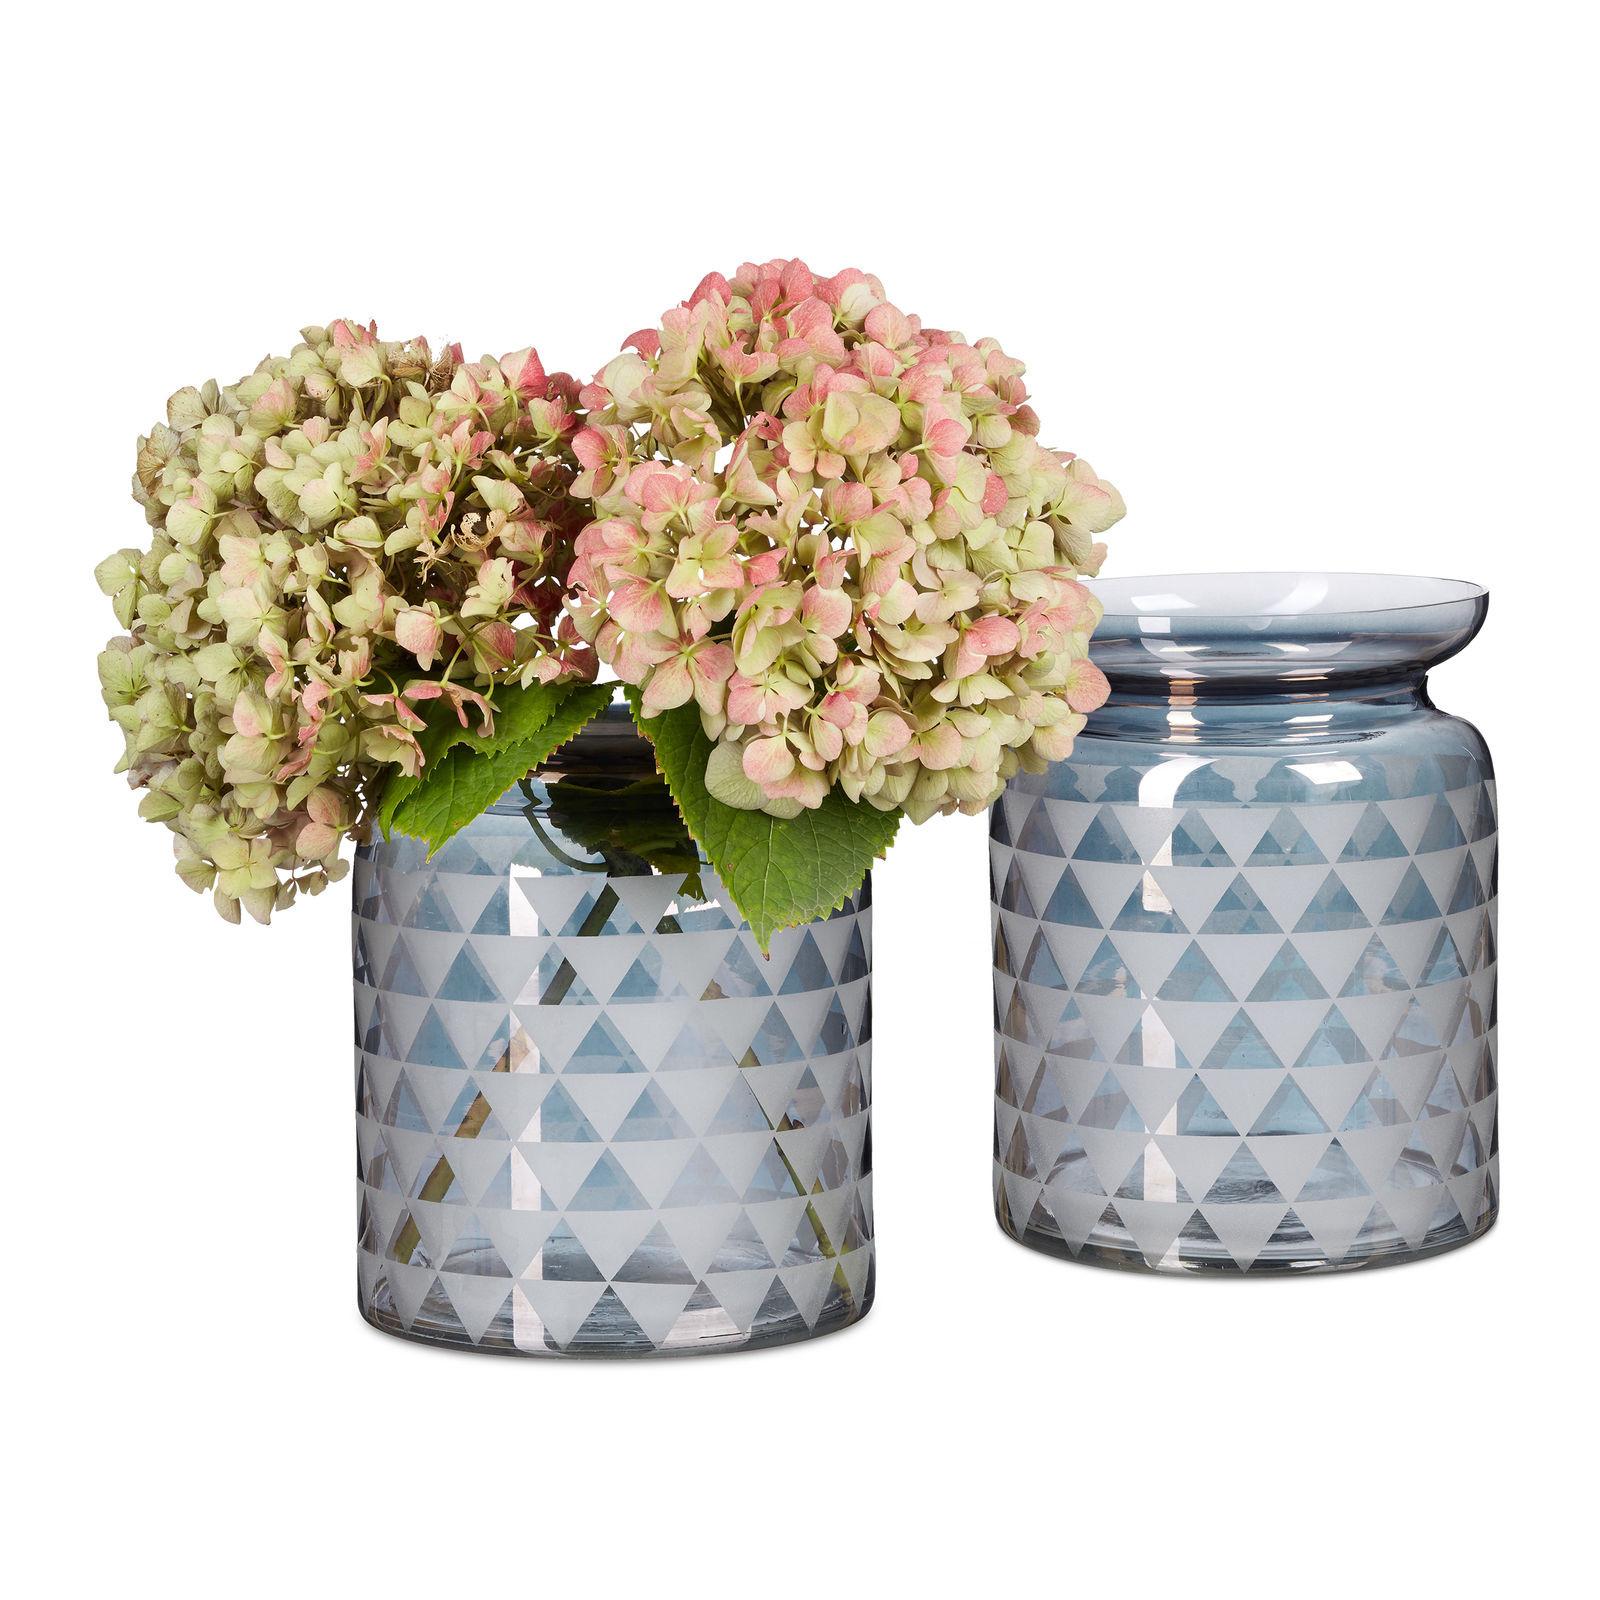 2x Dekovase Designvase Glasvase Bodenvase Blumenvase Tischvase Glas Grafikmuster